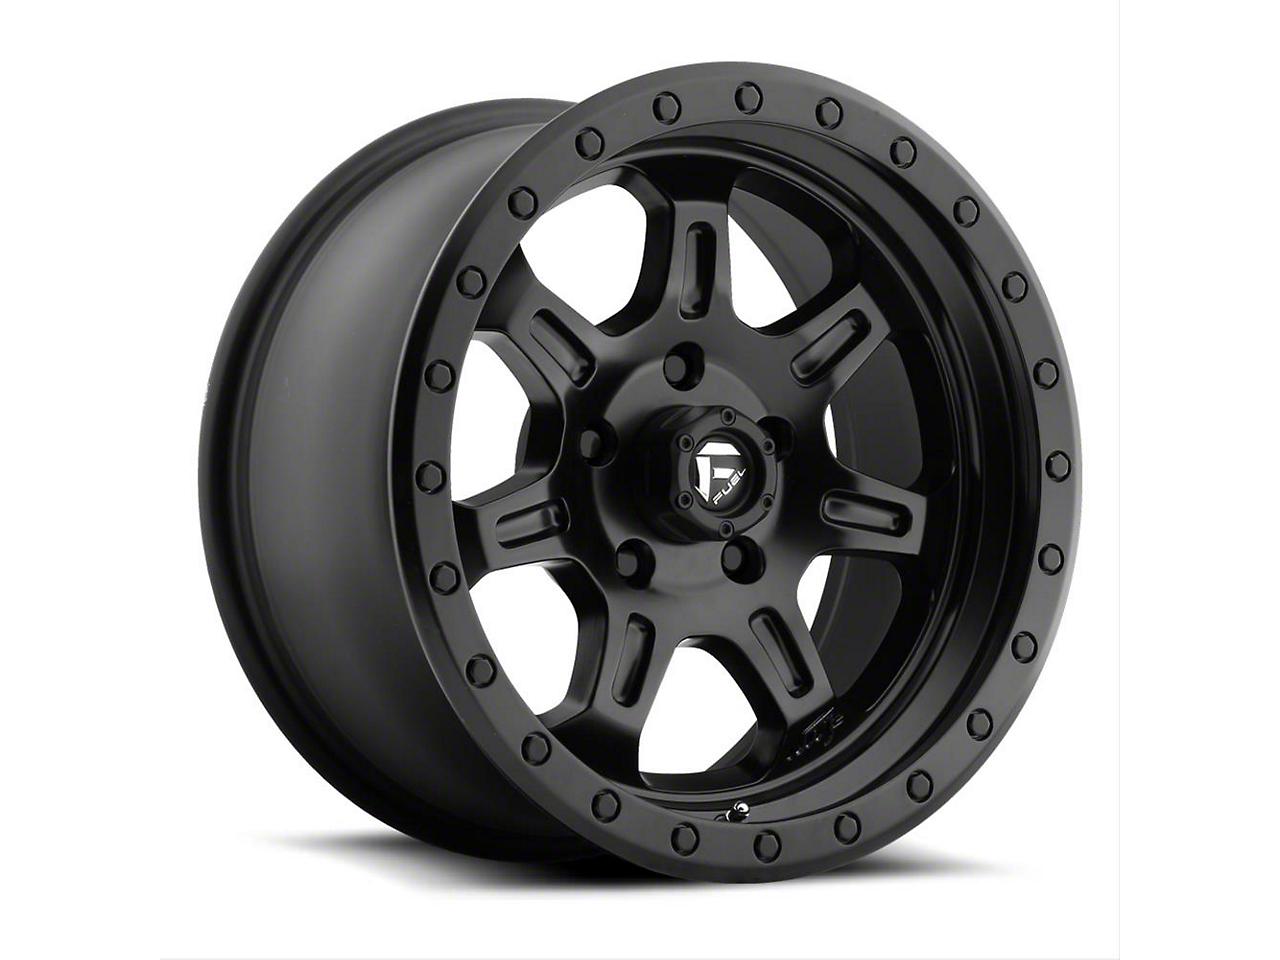 Fuel Wheels JM2 Matte Black 5-Lug Wheel - 17x8.5 (02-18 RAM 1500, Excluding Mega Cab)